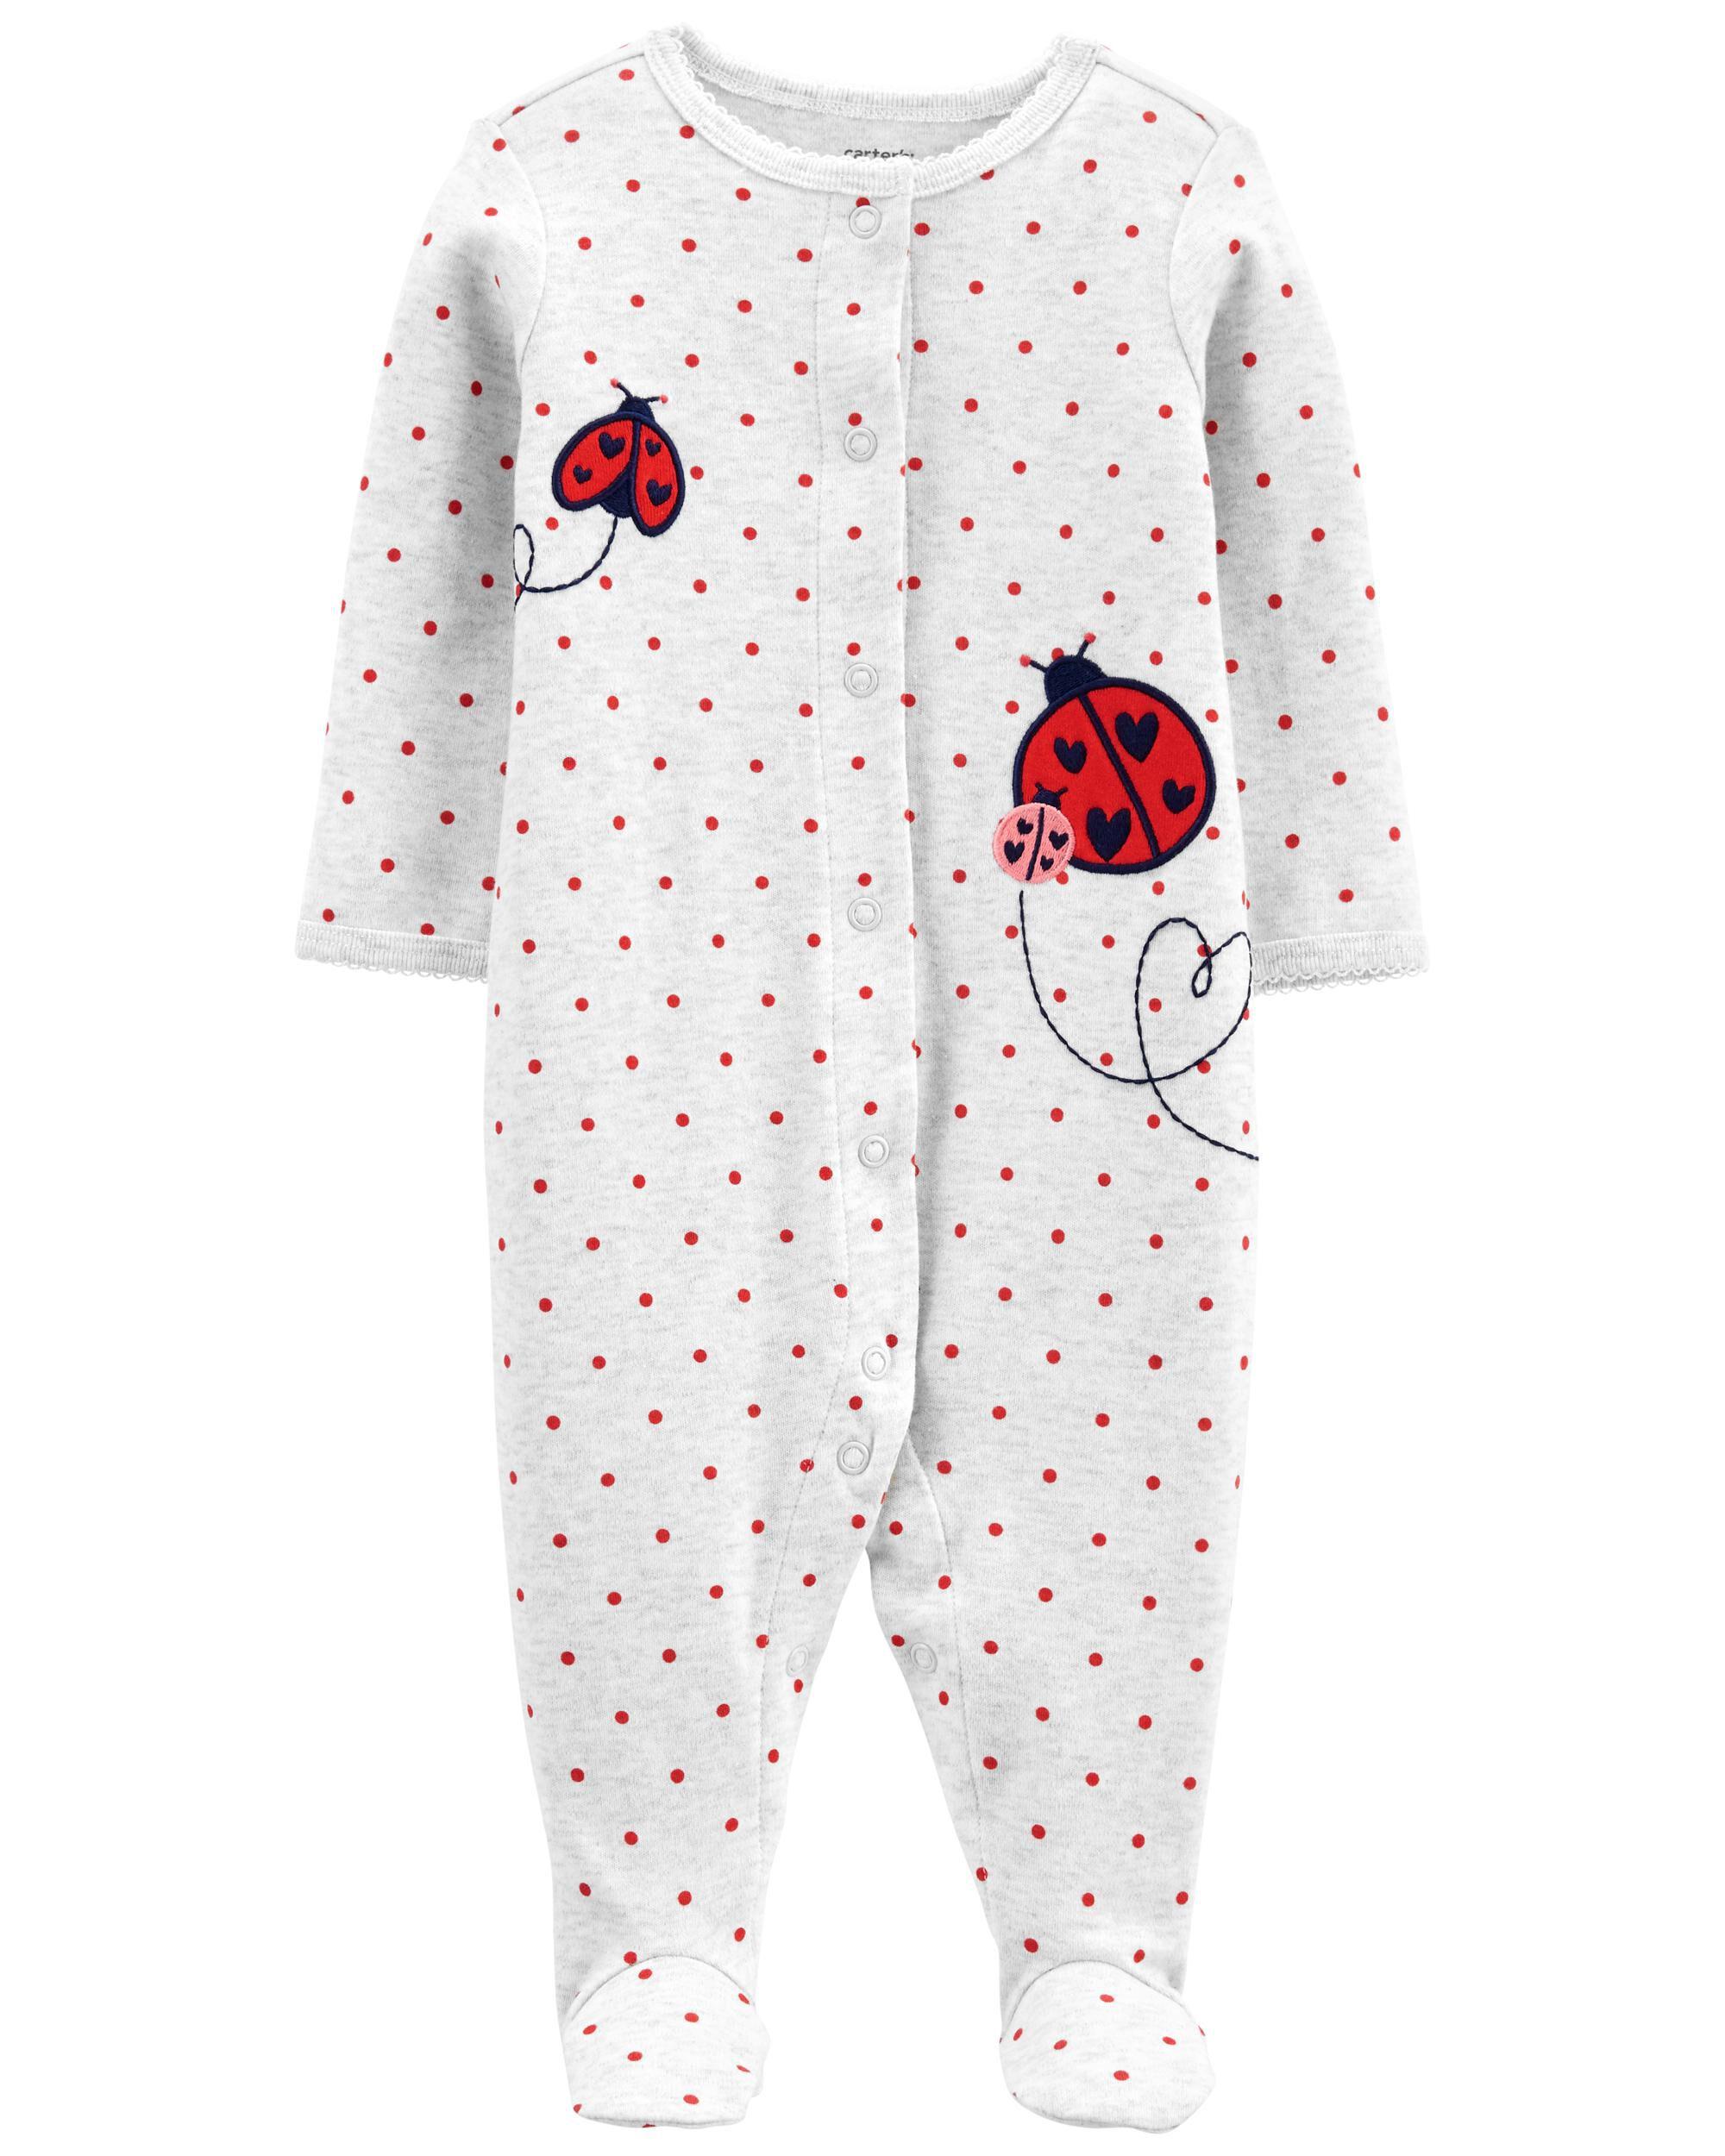 Carters Ladybug Snap-Up Cotton Sleep & Play